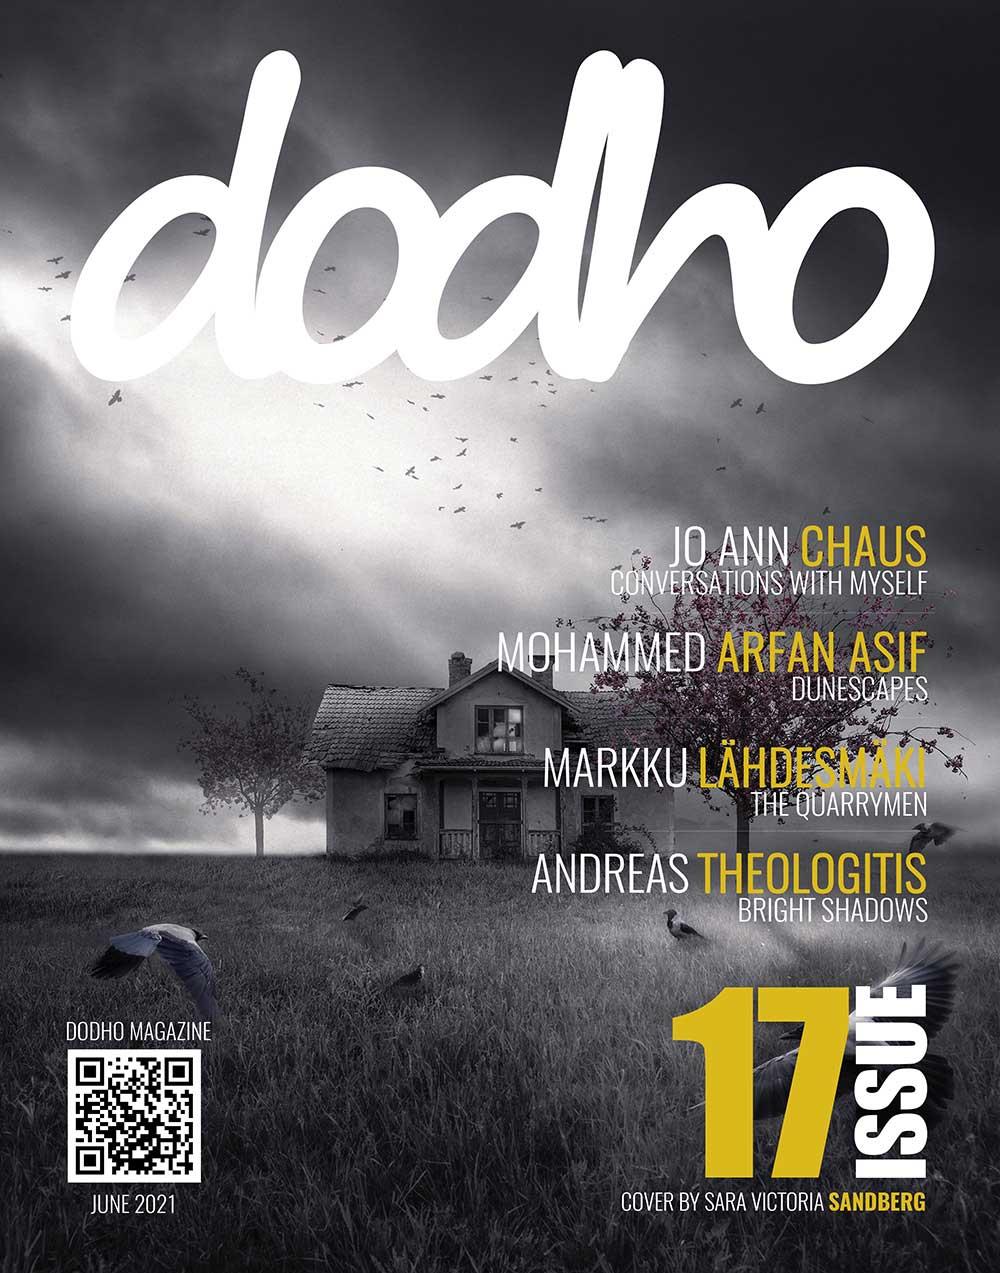 https://www.dodho.com/wp-content/uploads/2021/06/Mcover17-1.jpg